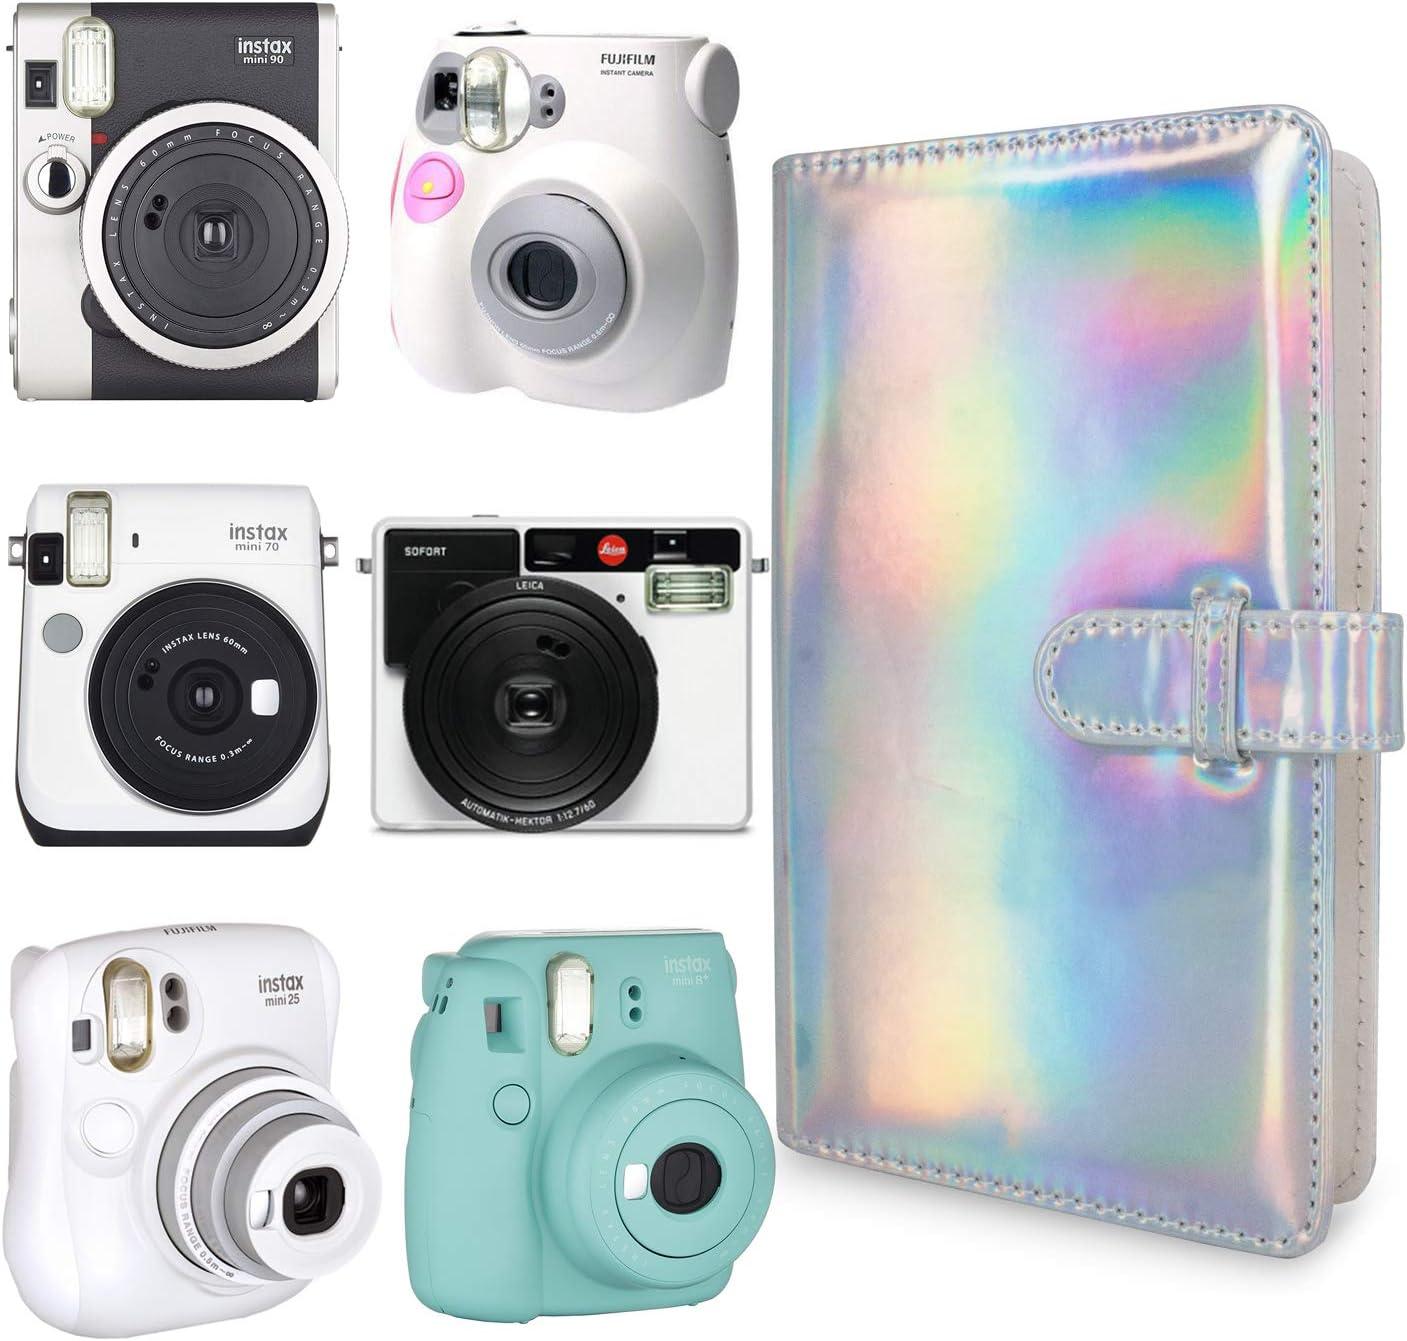 Polaroid PIC-300 Z2300 Film Square WOLVEN Mini Photo Album for Fujifilm Instax Mini 7s 8 9 25 26 50s 70 90 Film